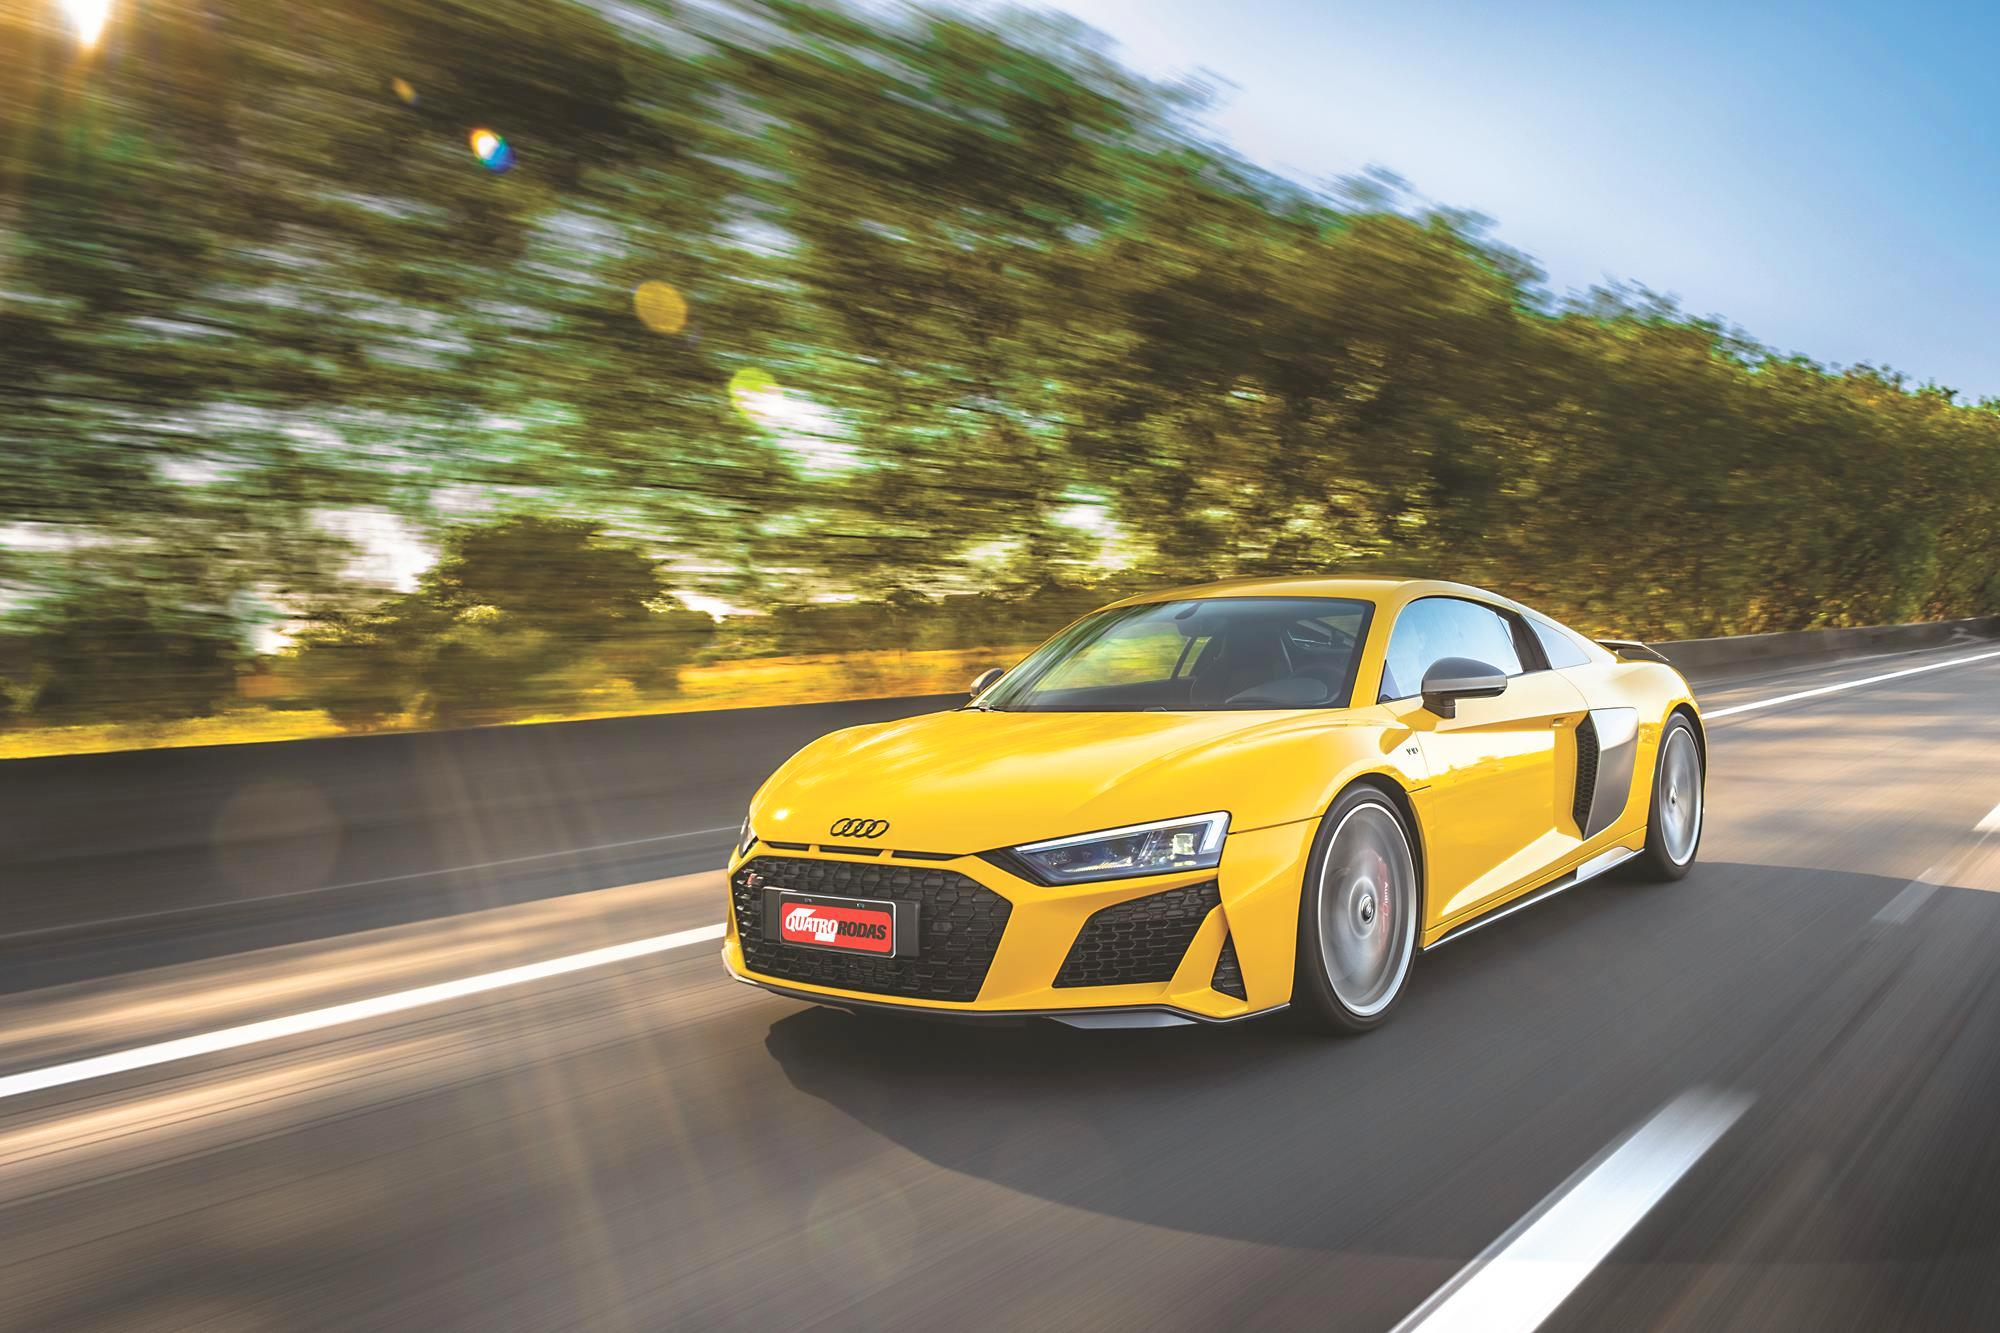 Audi R8 V10 Performance 2020 amarelo